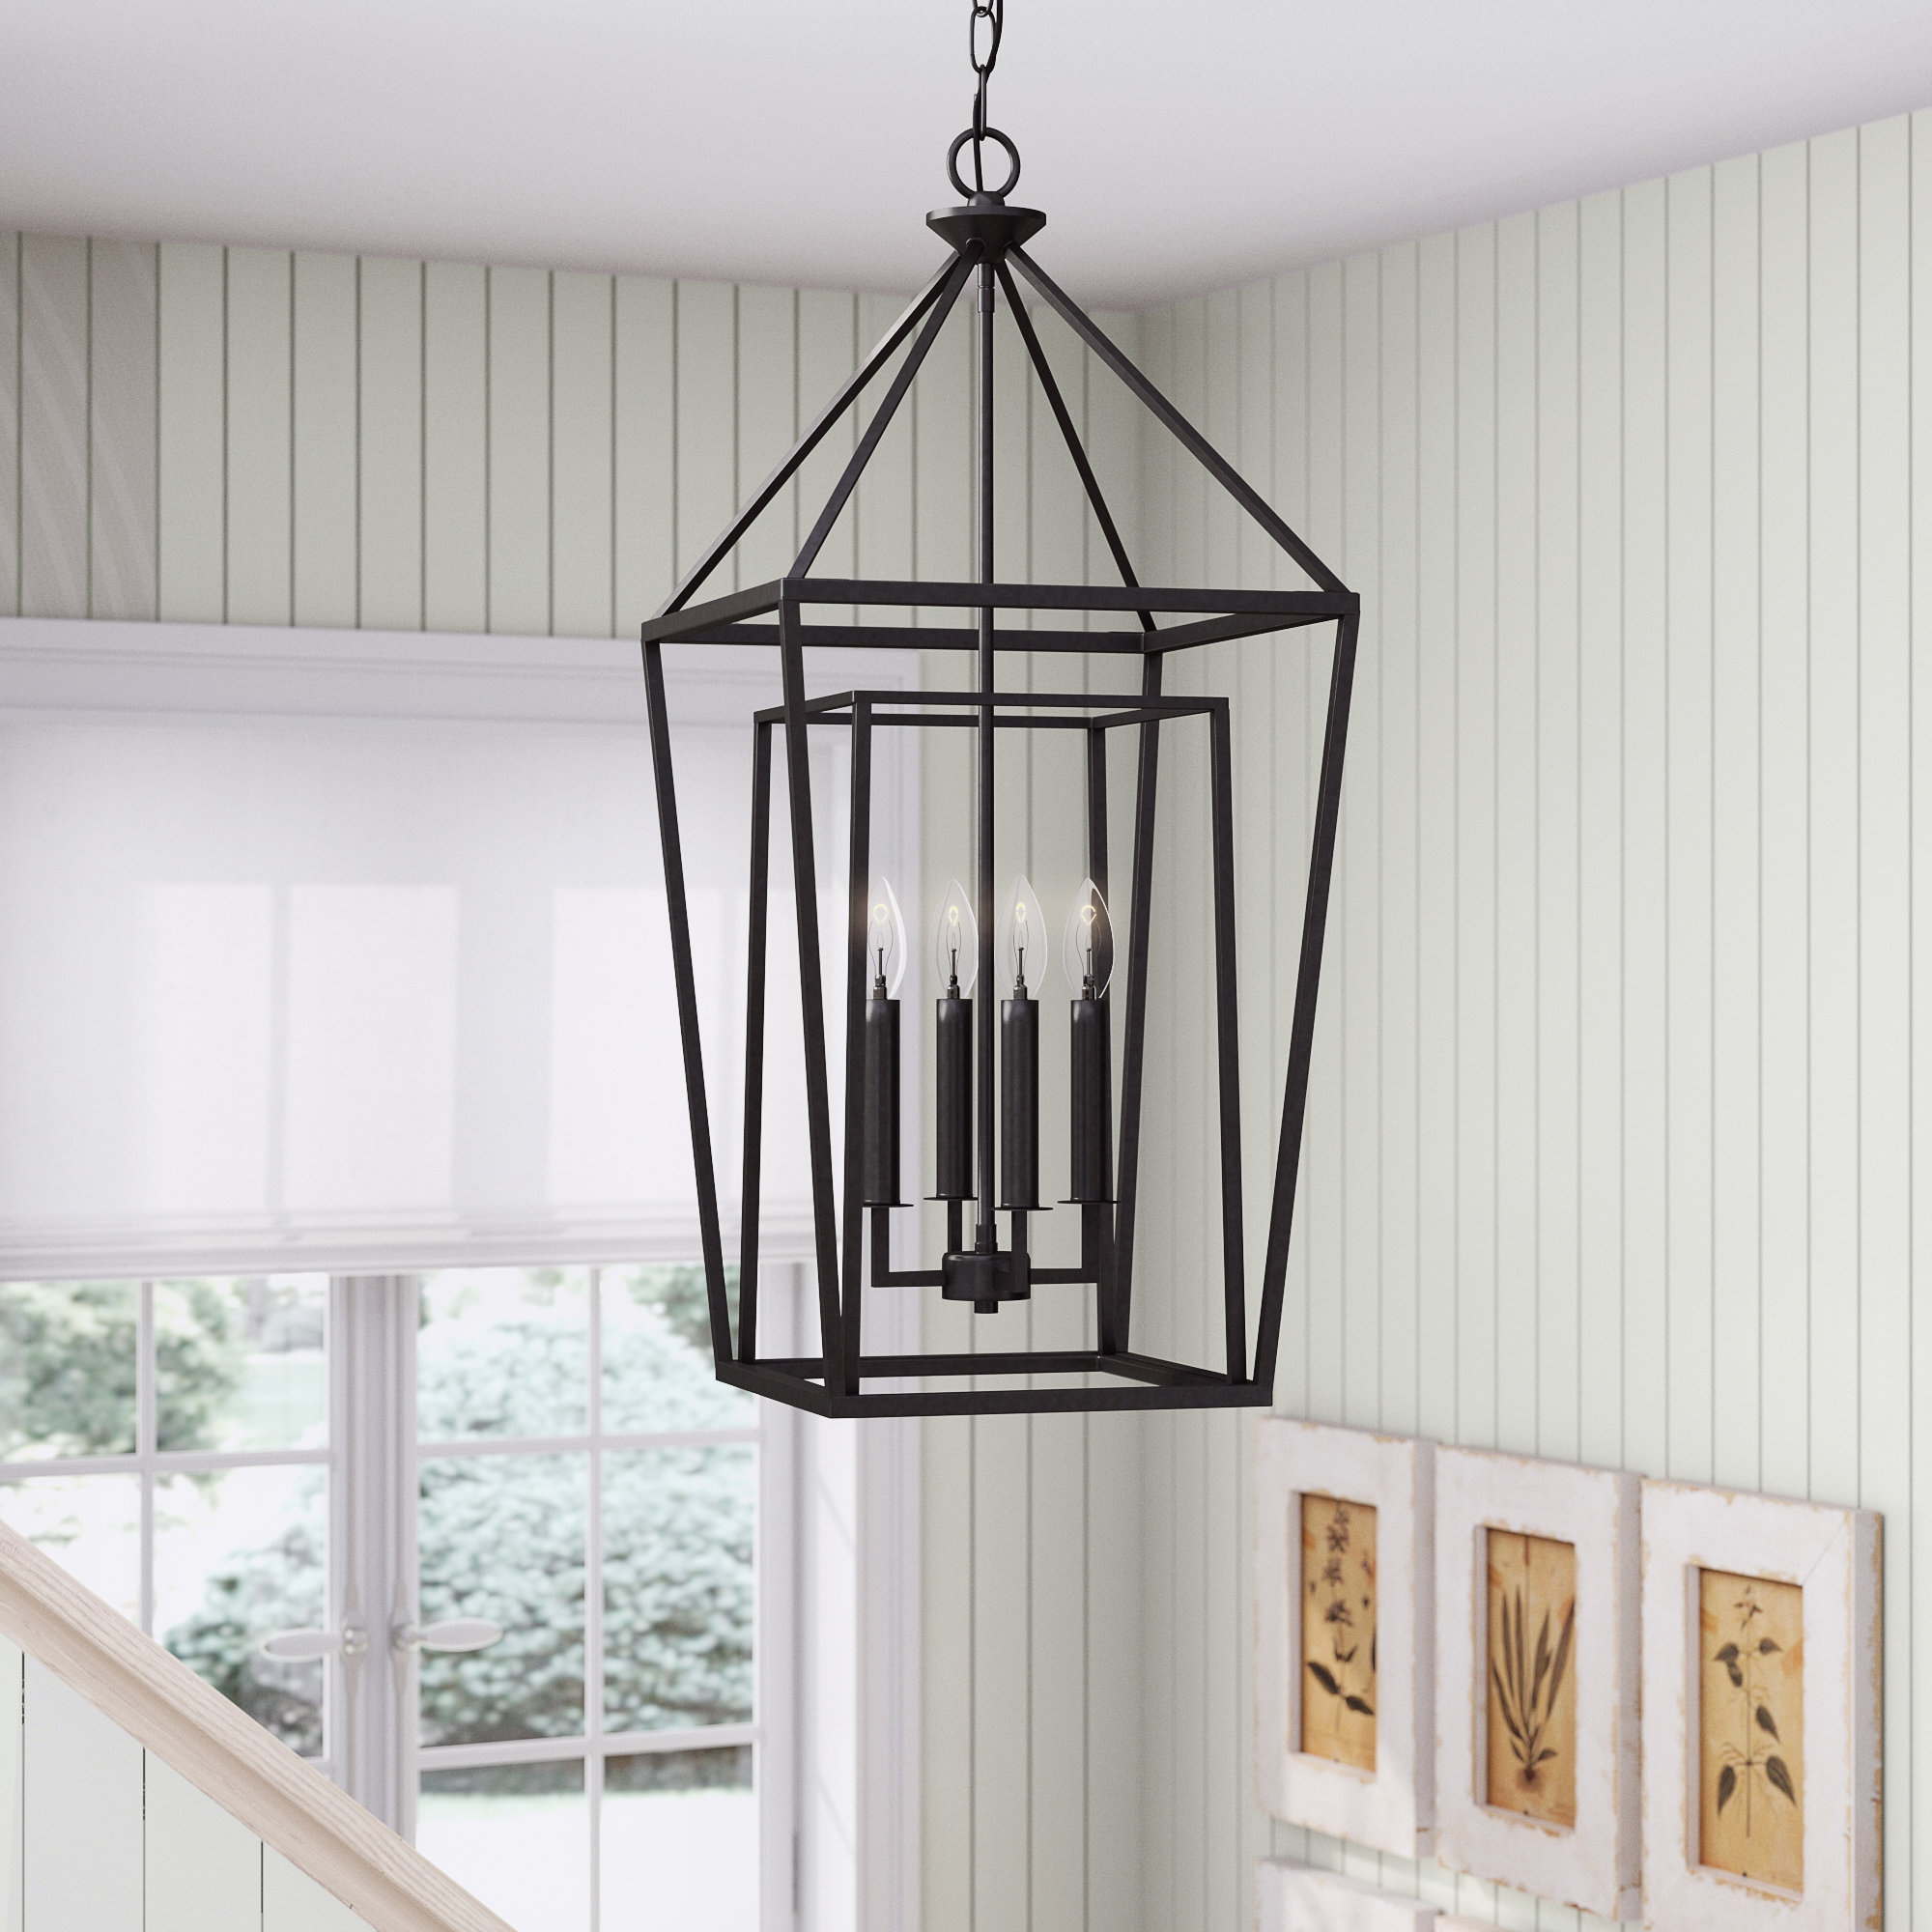 Favorite Varnum 4 Light Lantern Pendants With Regard To Roodhouse 4 Light Lantern Geometric Pendant (View 5 of 20)